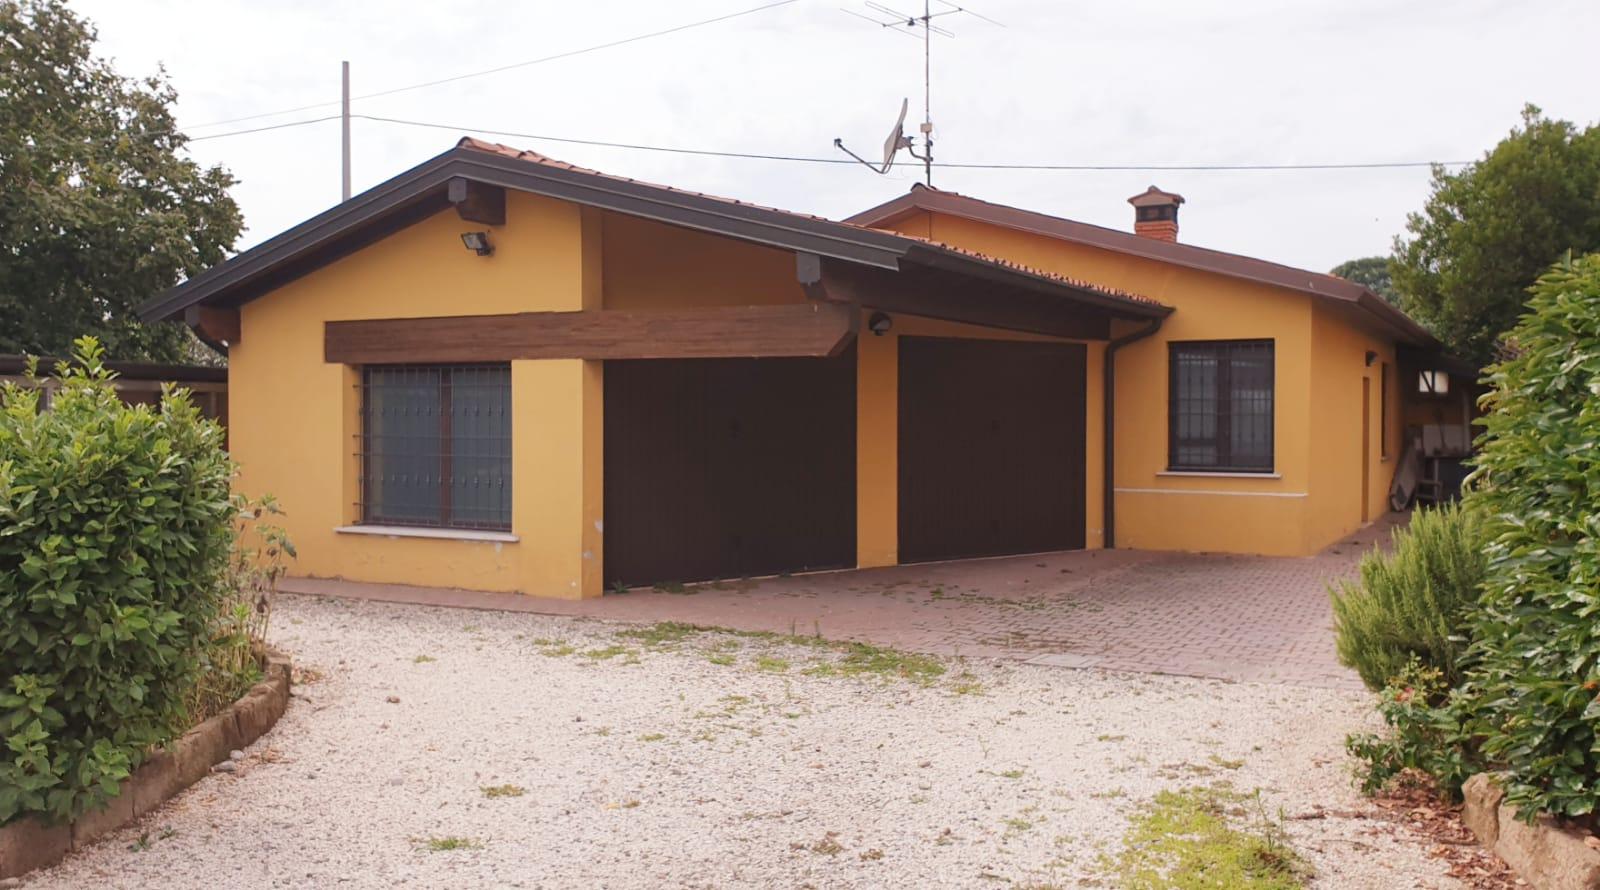 CASA INDIPENDENTE in Vendita a Lograto (BRESCIA)